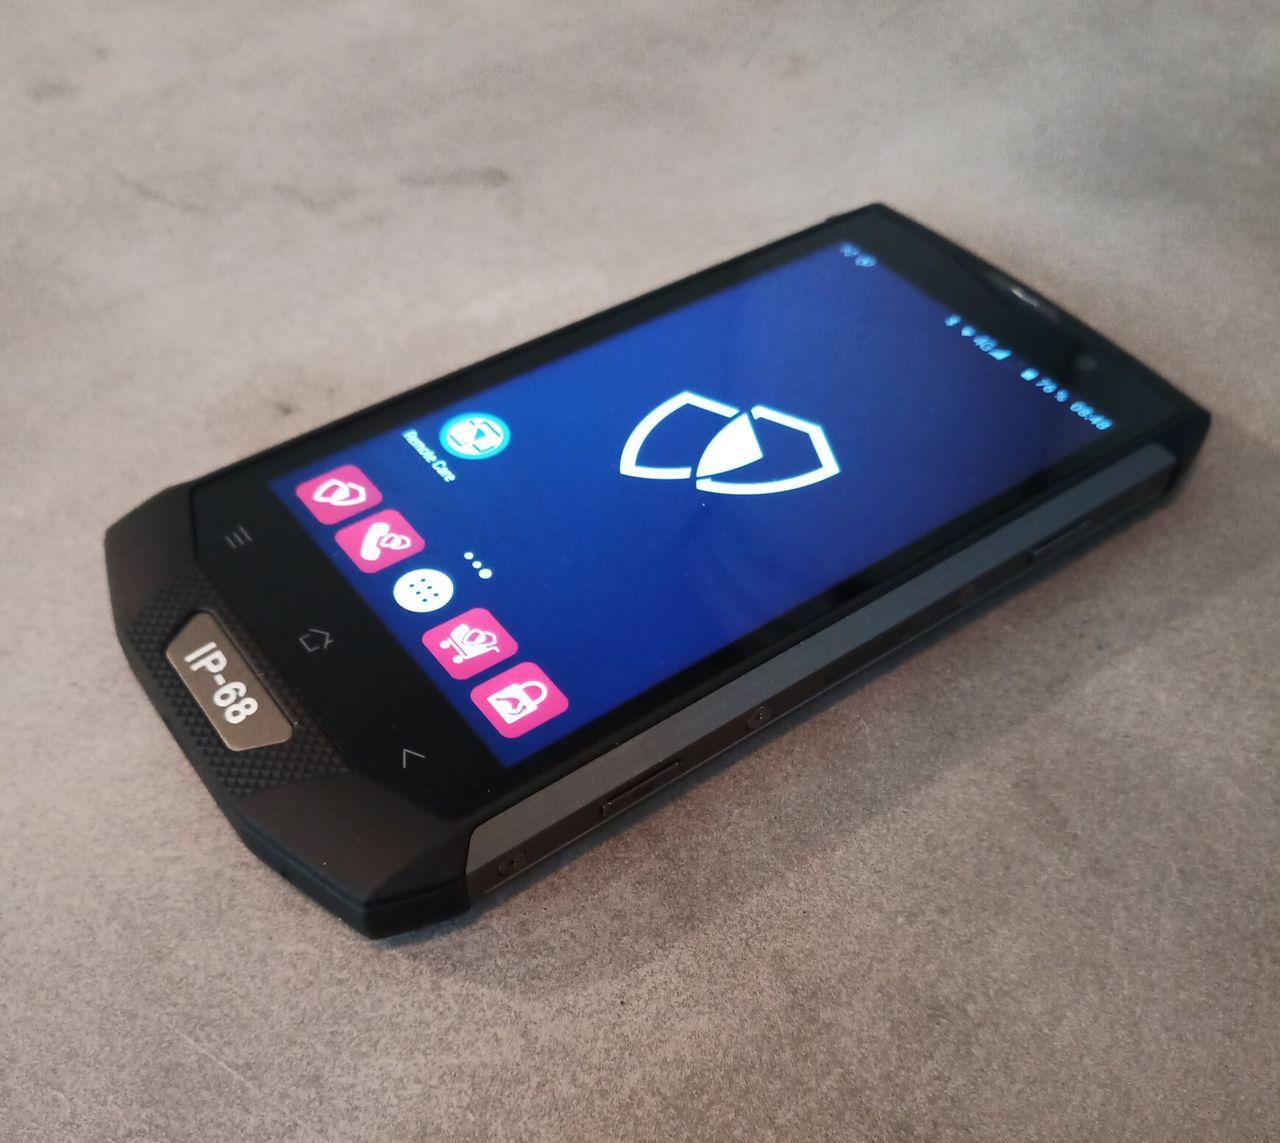 R-MOR IntactPhone lanseras i Sverige